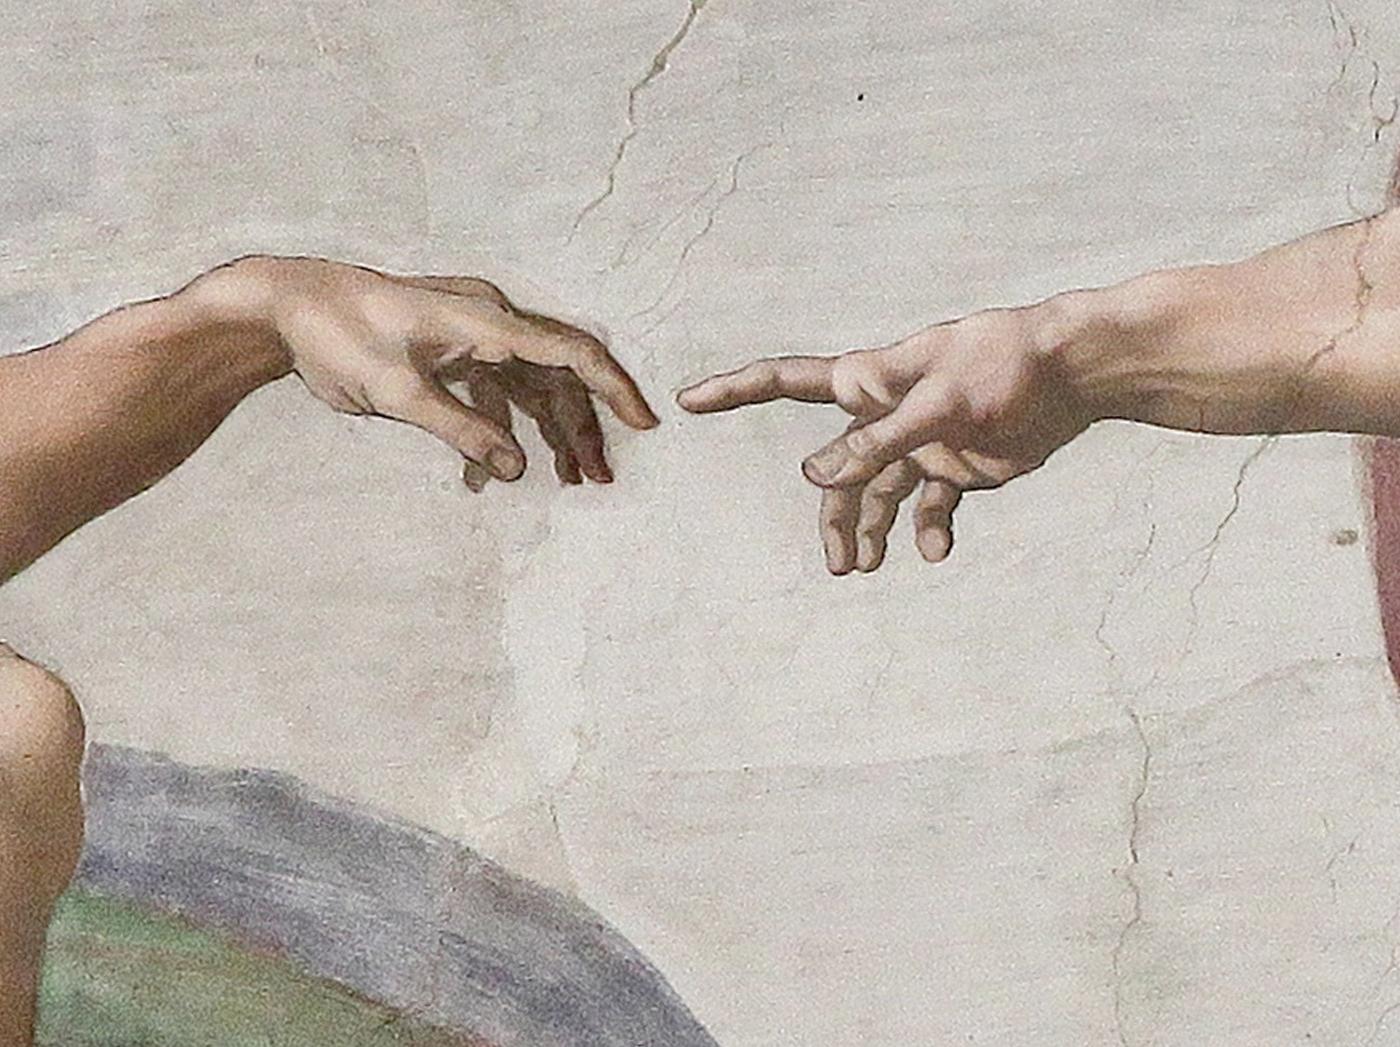 Wiki commons: Creation_of_Adam_(Michelangelo)_Detail.jpg (400 × 299 pixels, file size: 49 KB, MIME type: image/jpeg)